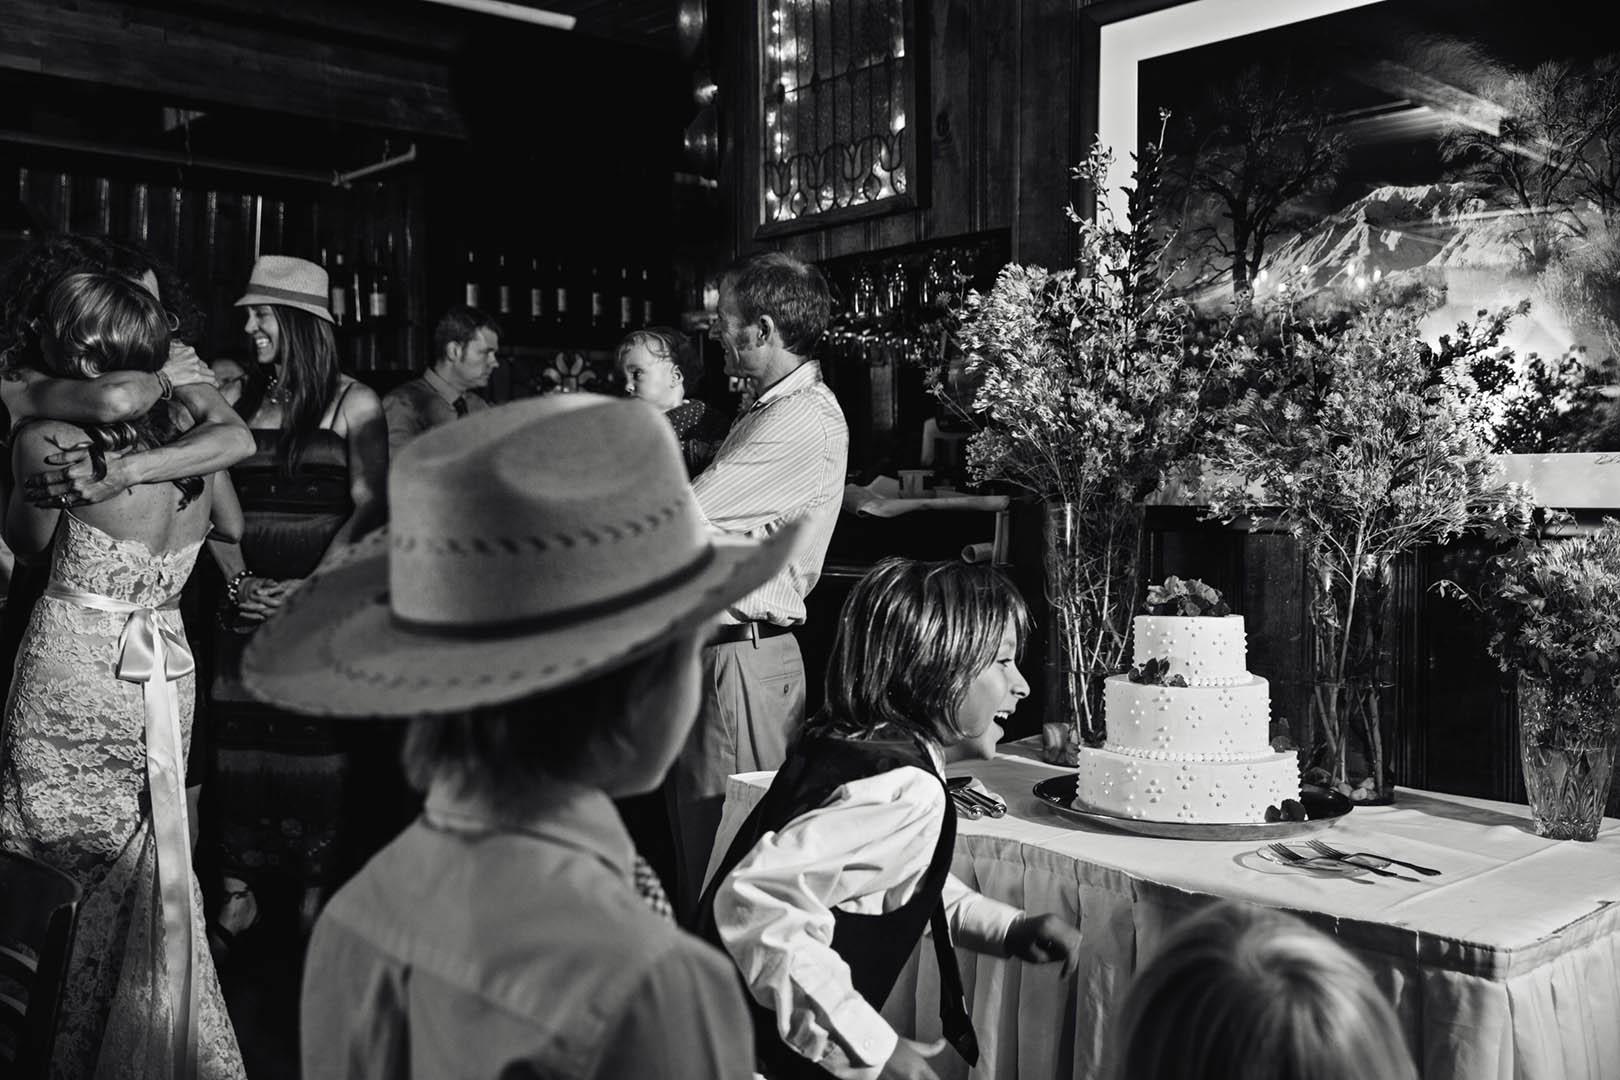 Kestrel_Jacob_Boulder_Wedding_19.jpg